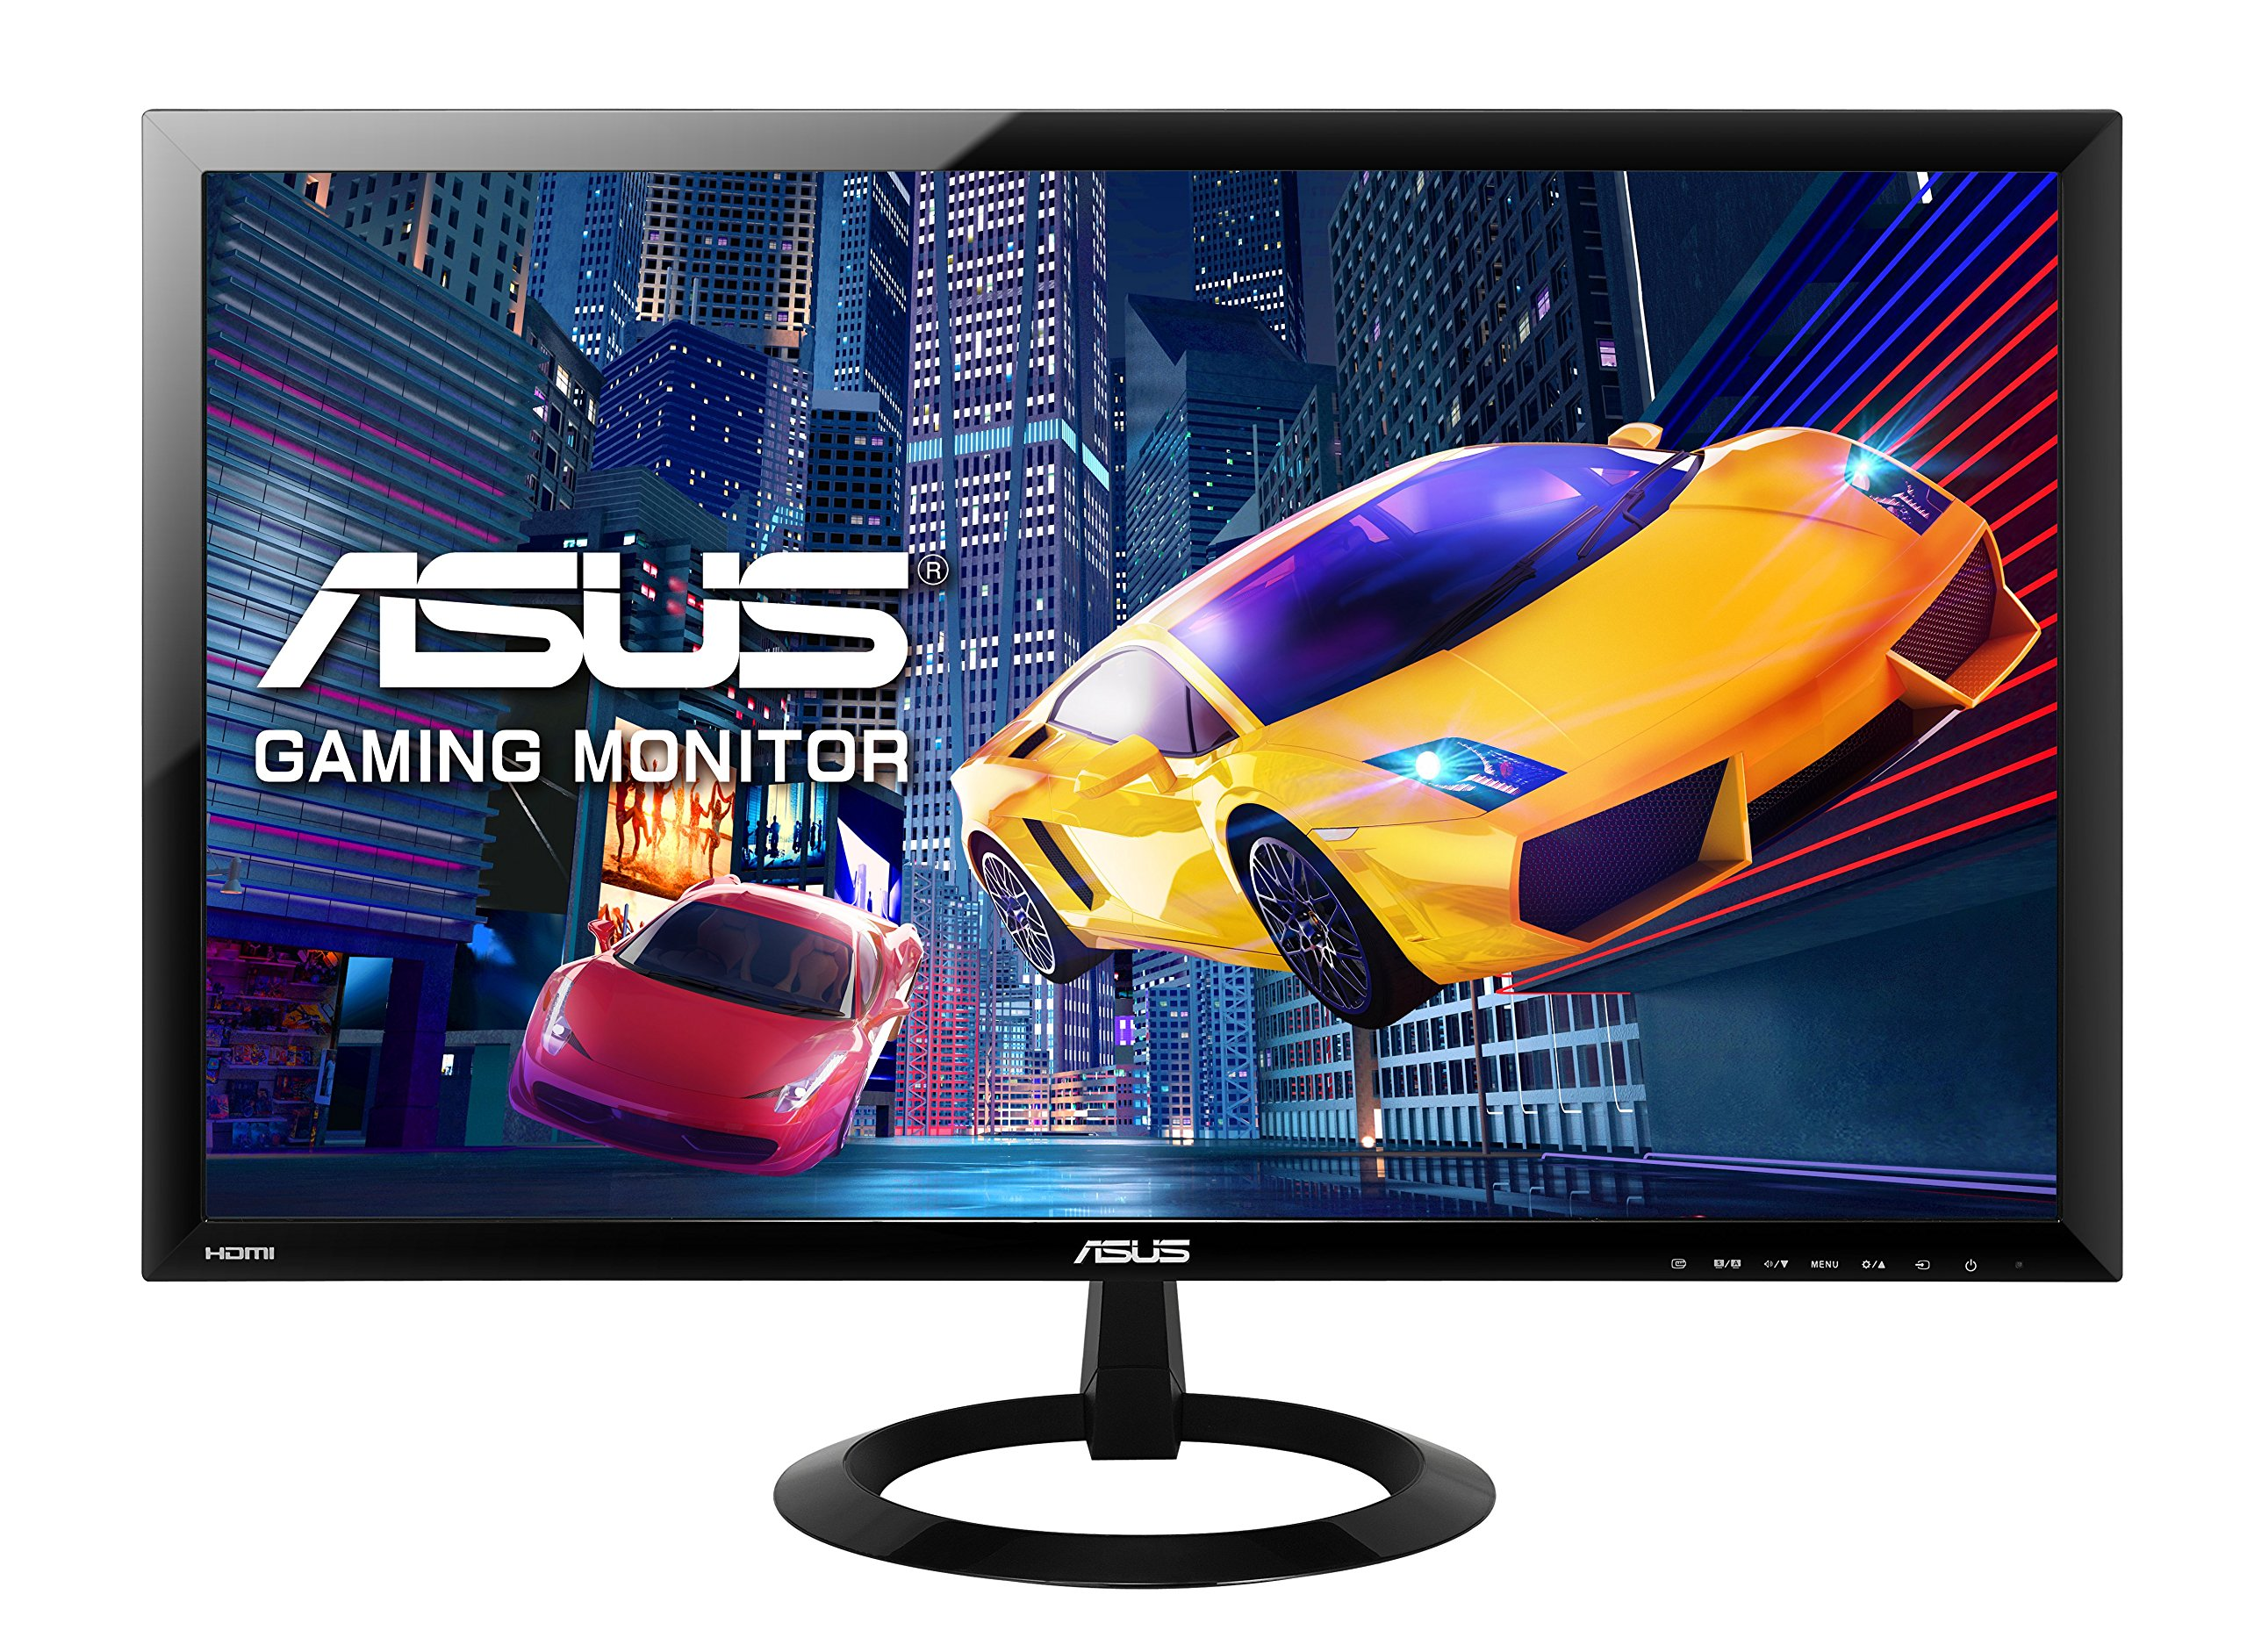 "Asus VX248H Ecran PC Gamer LED 24"" 1920 x 1080 1ms VGA/HDMI product image"